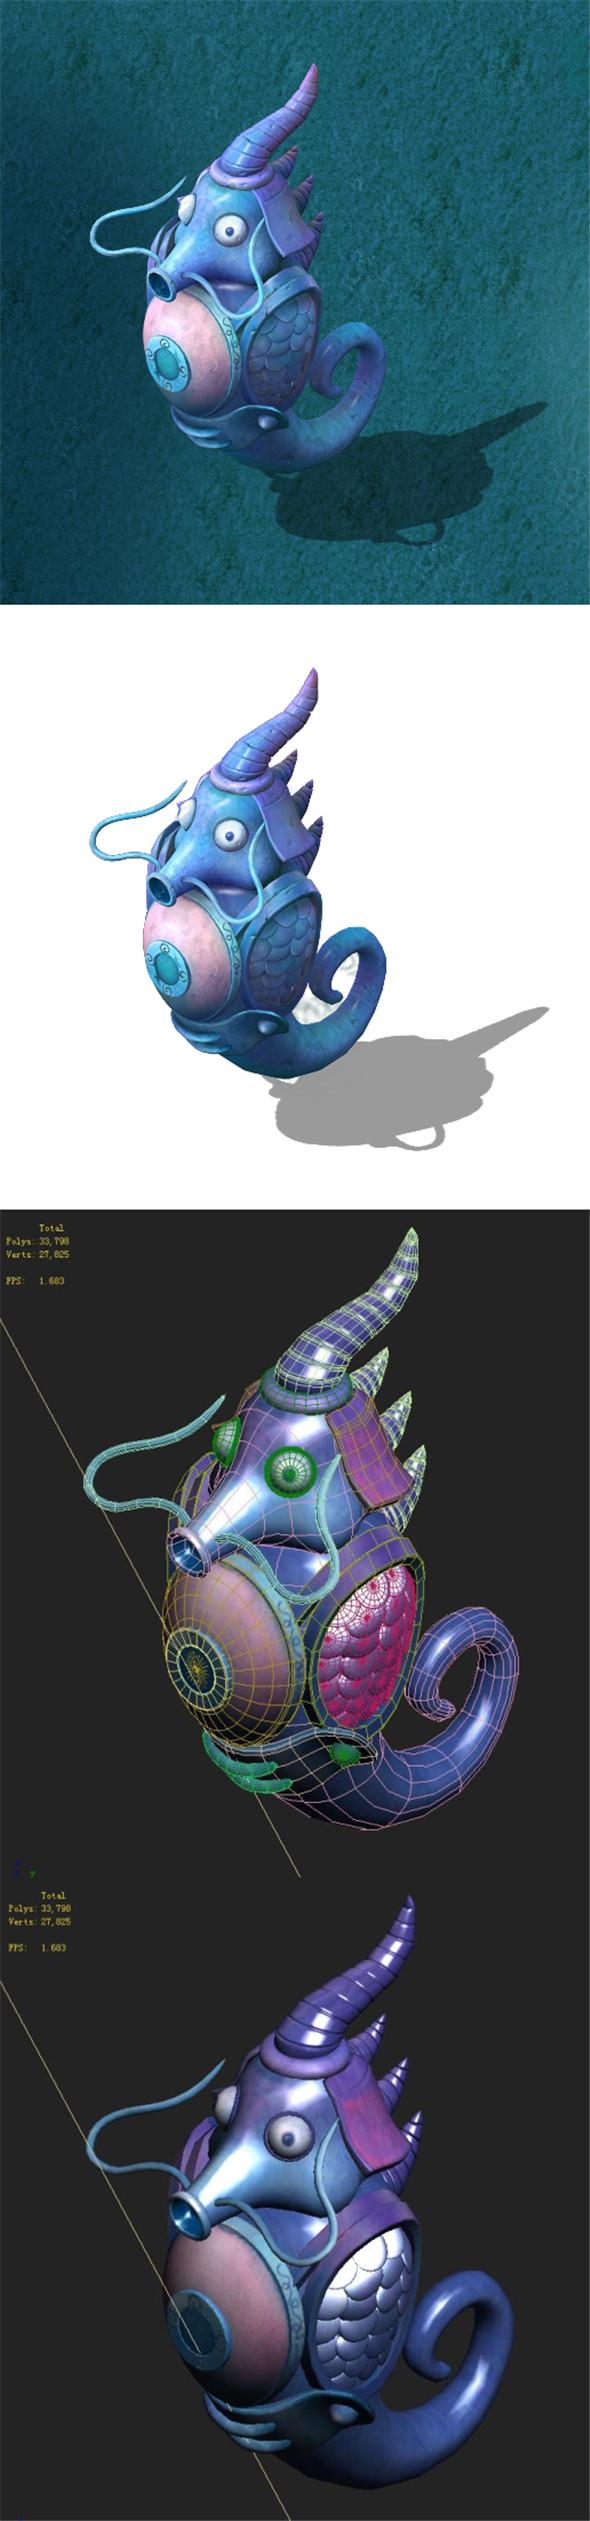 Submarine cartoon world - Dragon Palace hippocampus guards - 3DOcean Item for Sale